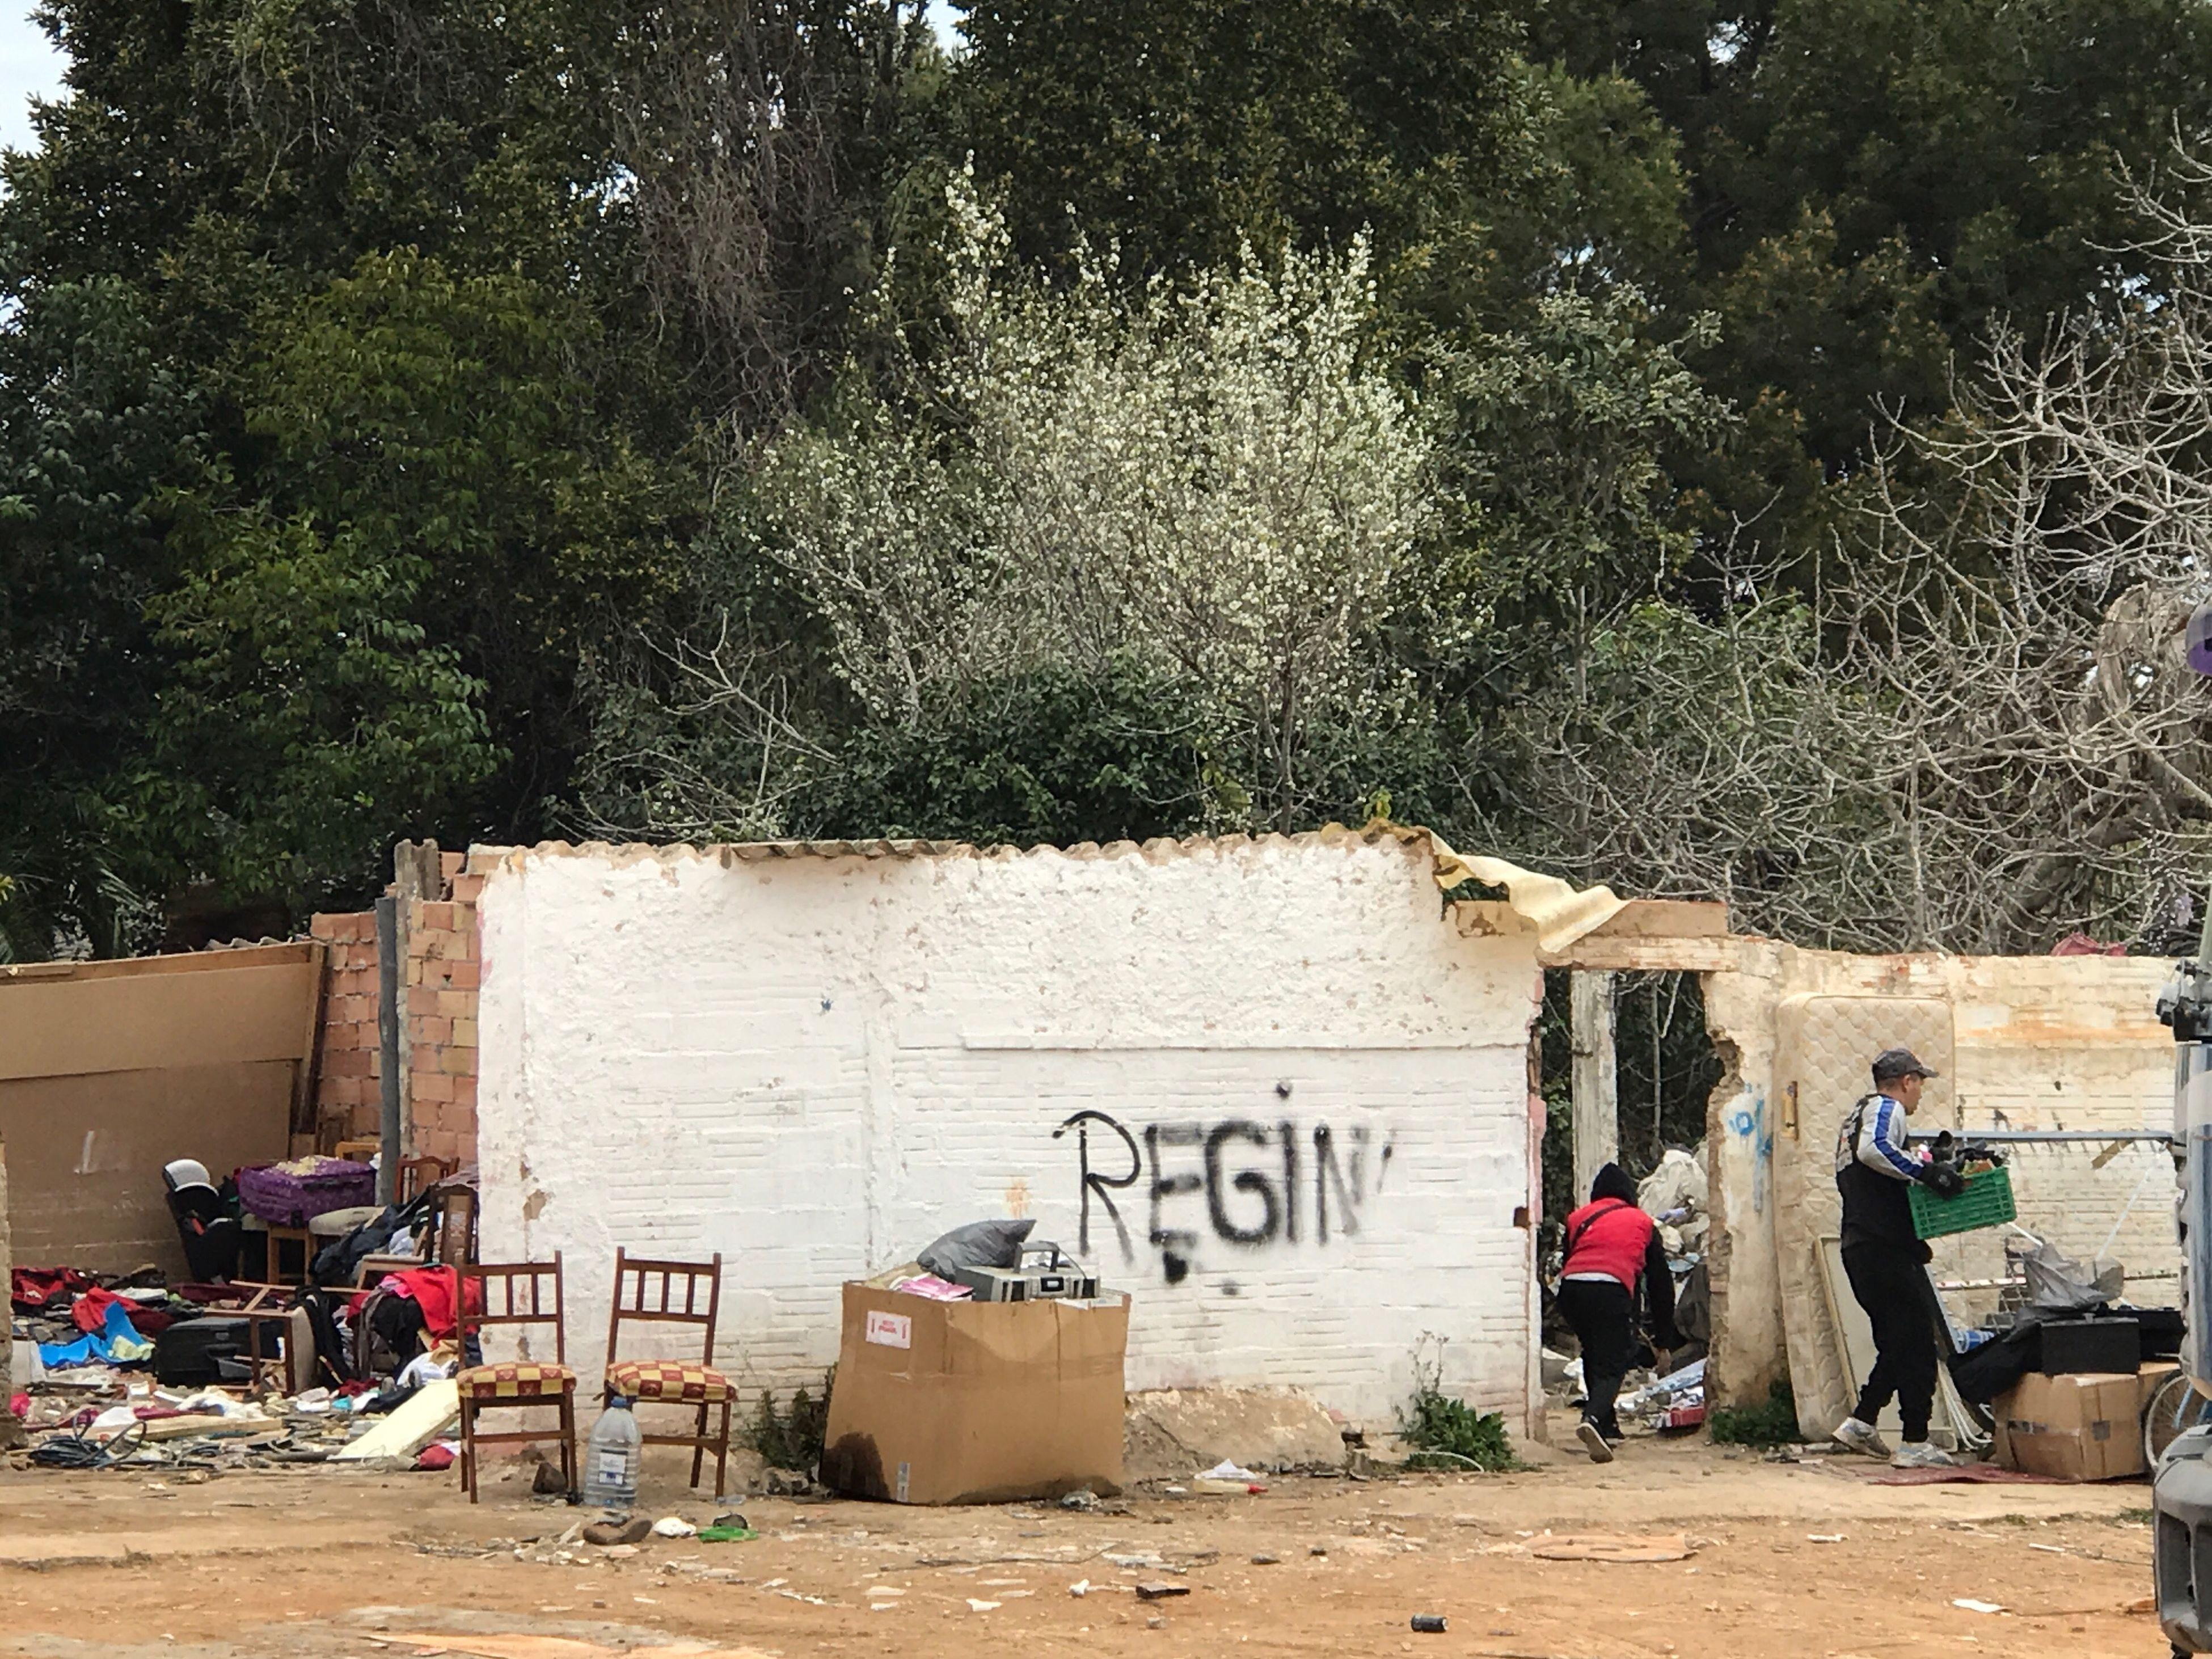 Deshaucio Pobreza Poverty Eviction Dislodged Chatarra EyeEmNewHere